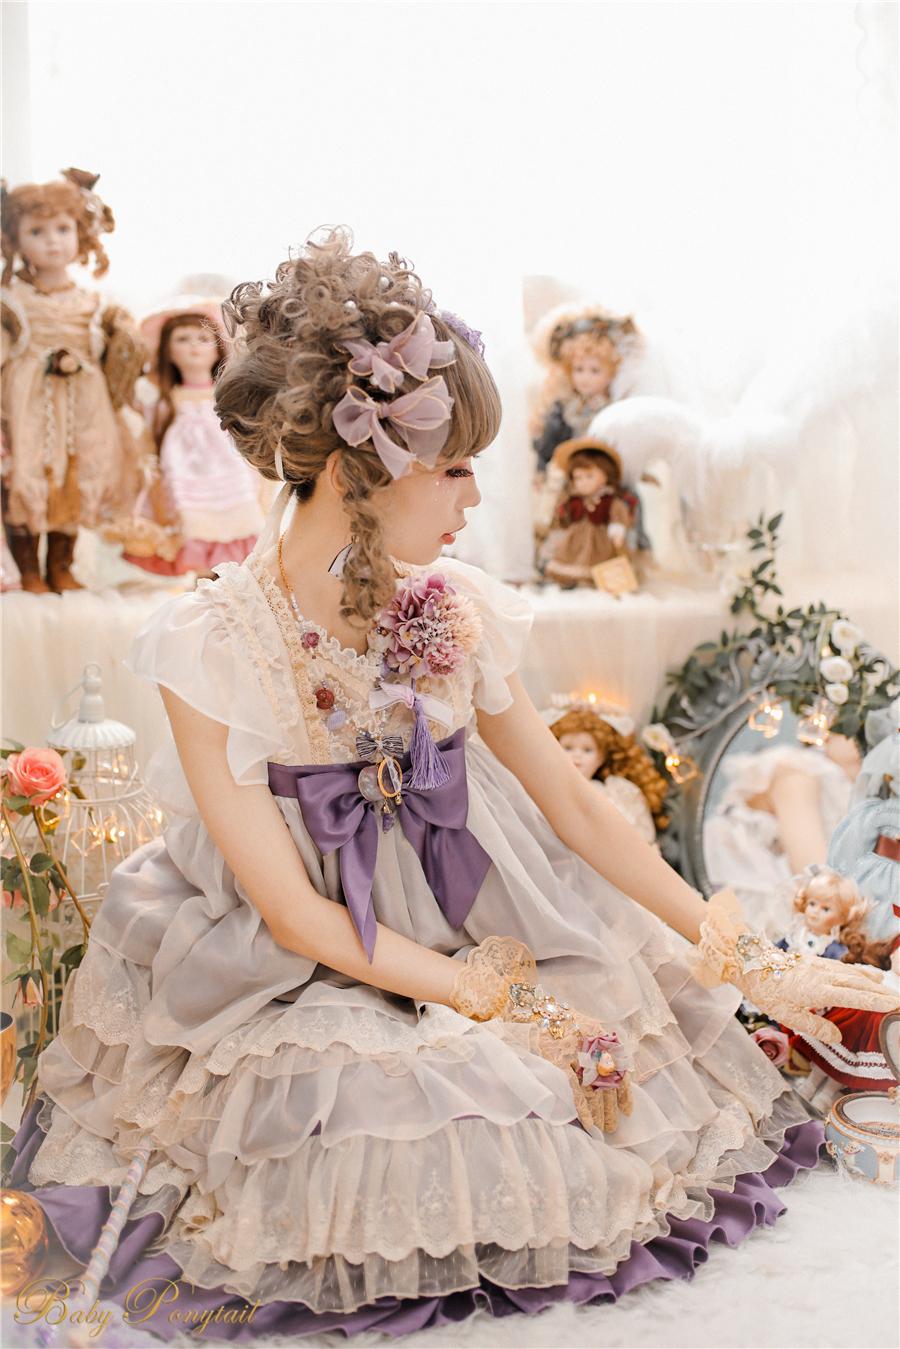 Babyponytail_Model Photo_Present Angel_JSK Violet_2_Kaka_11.jpg